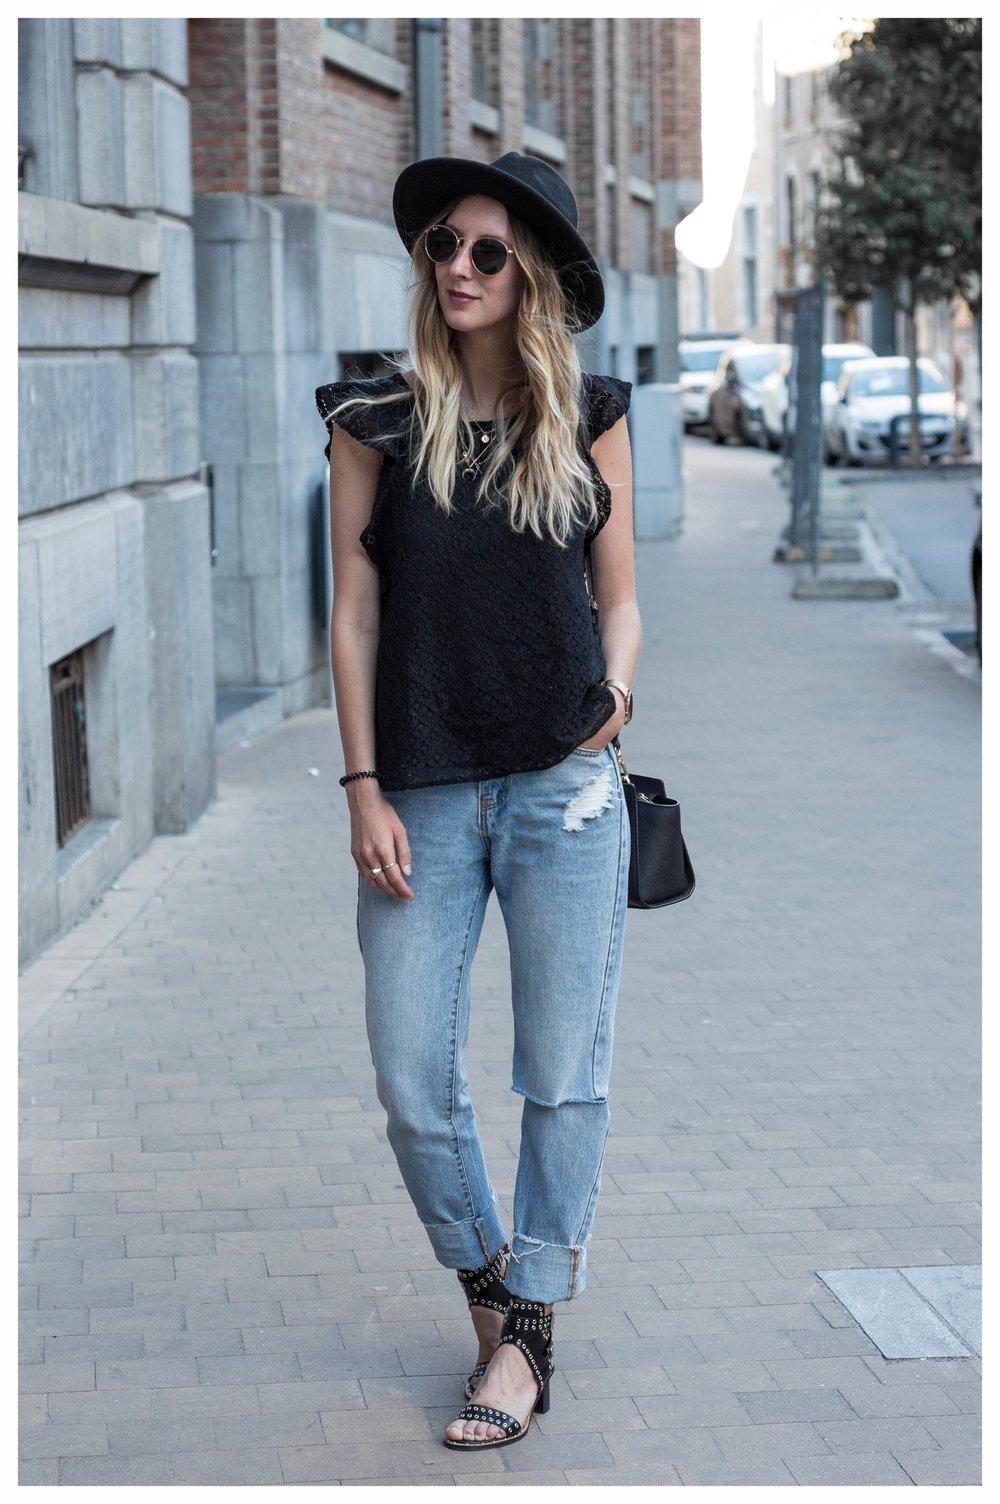 Street Style Namur - OSIARAH.COM (12 of 19).jpg